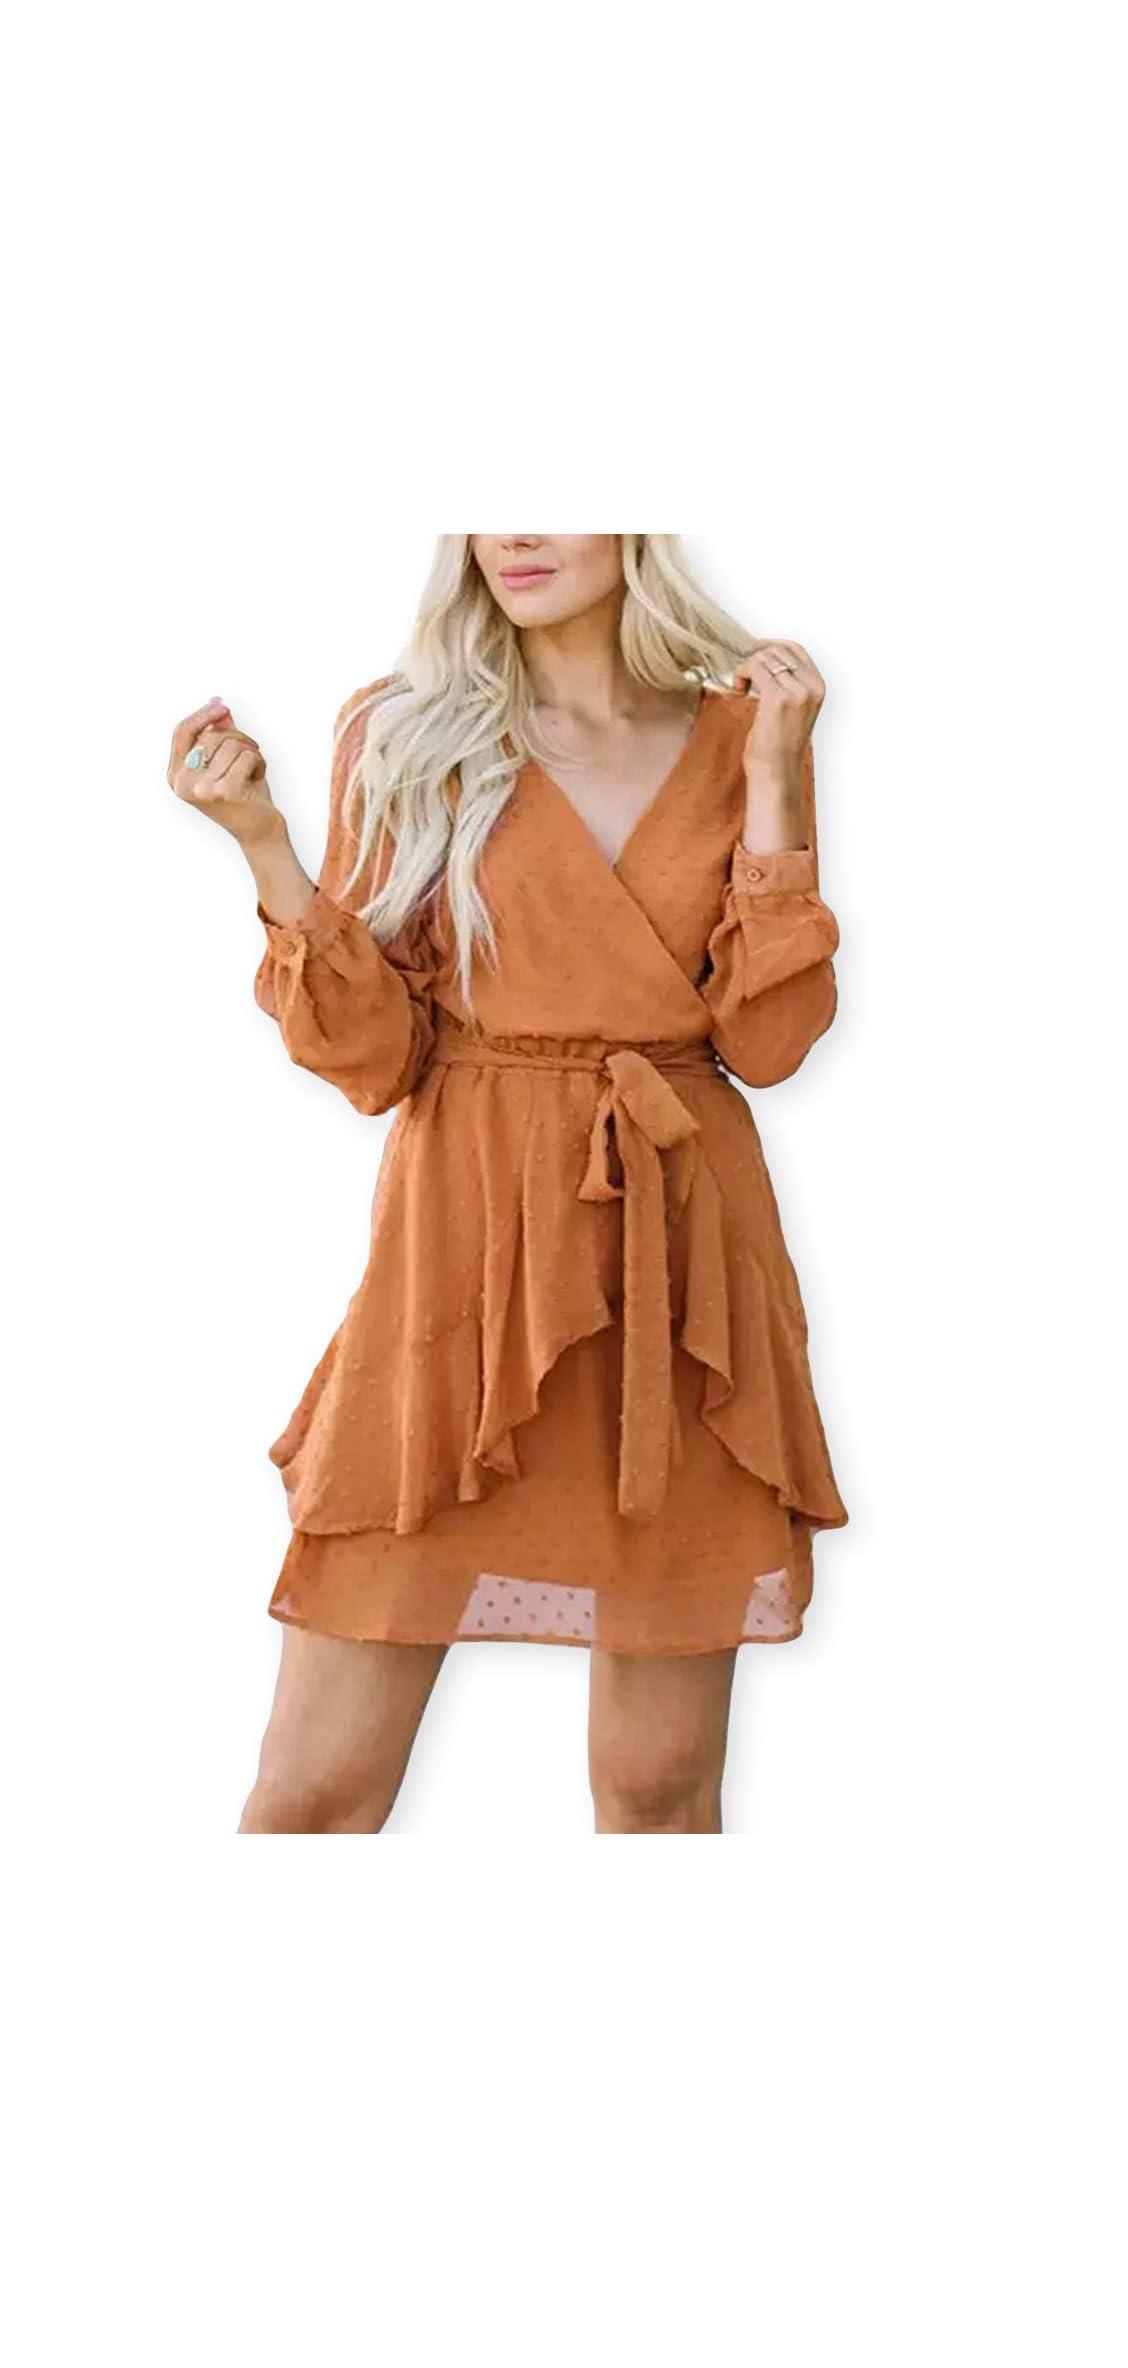 Women Cute V Neck Long Sleeve Mini Dresses Solid Polka